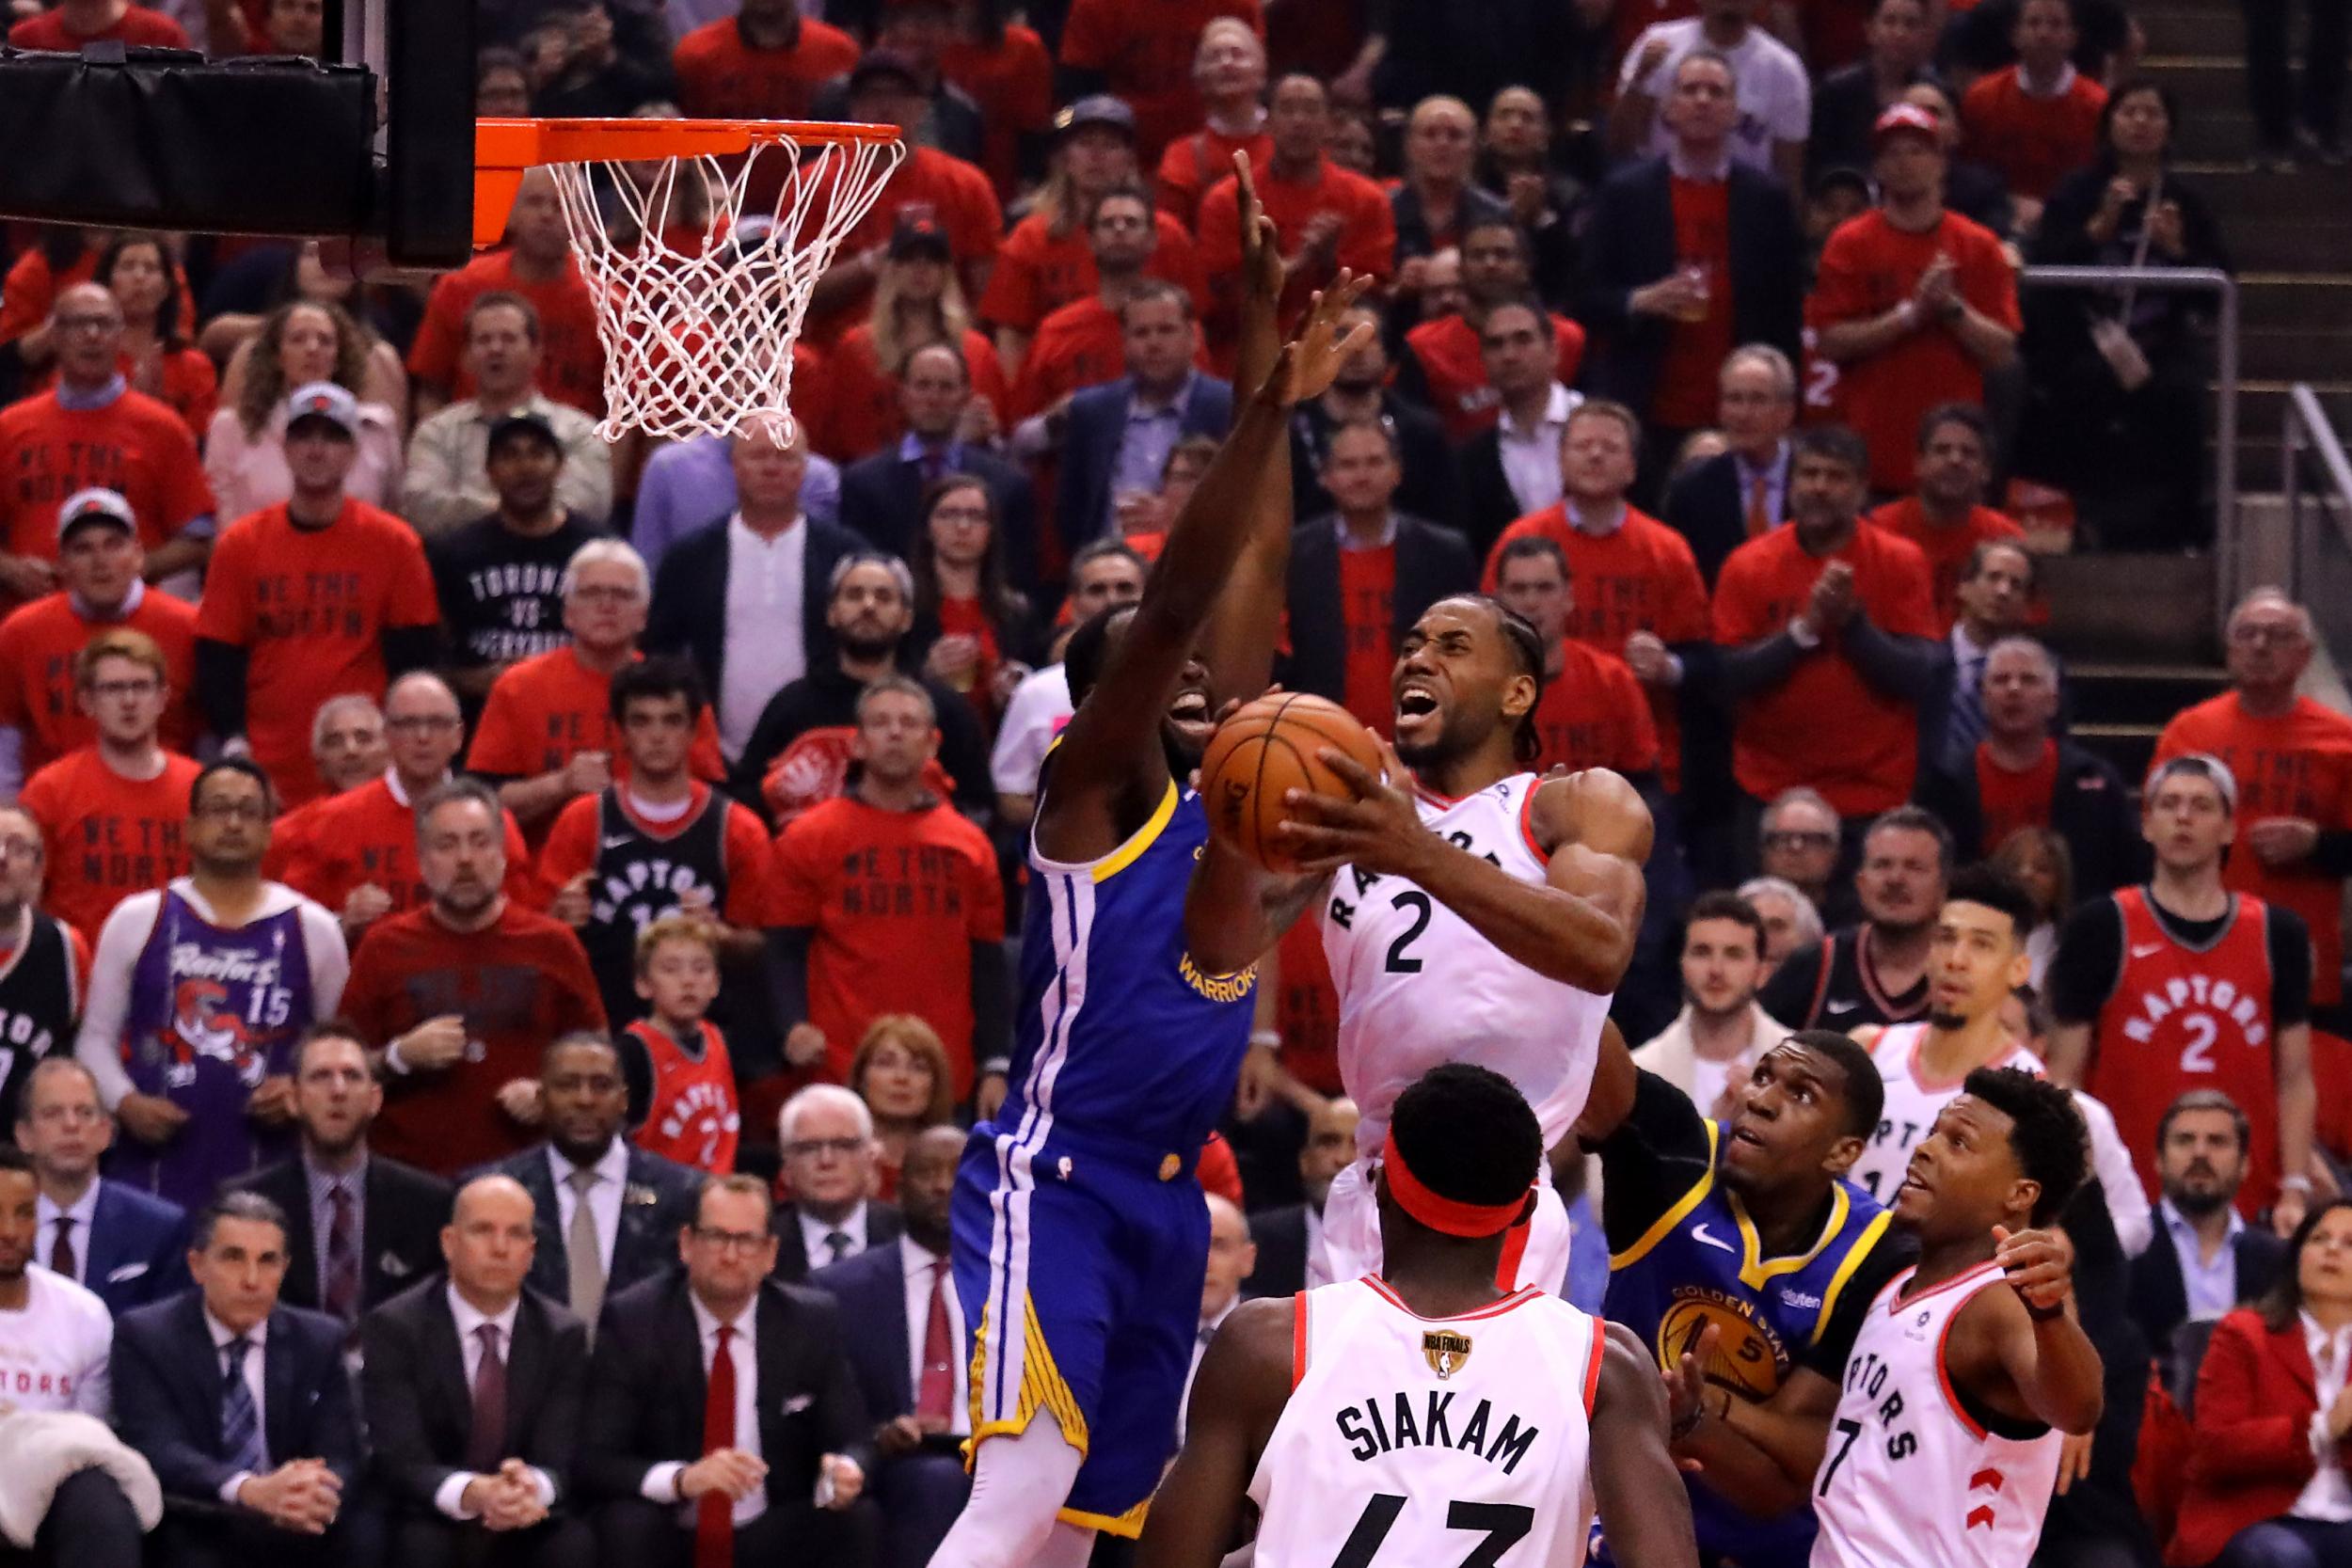 wholesale dealer a1a1d 5d015 NBA Finals 2019  What the Experts Say Ahead of Game 6 Toronto Raptors Vs  Golden State Warriors, Predictions